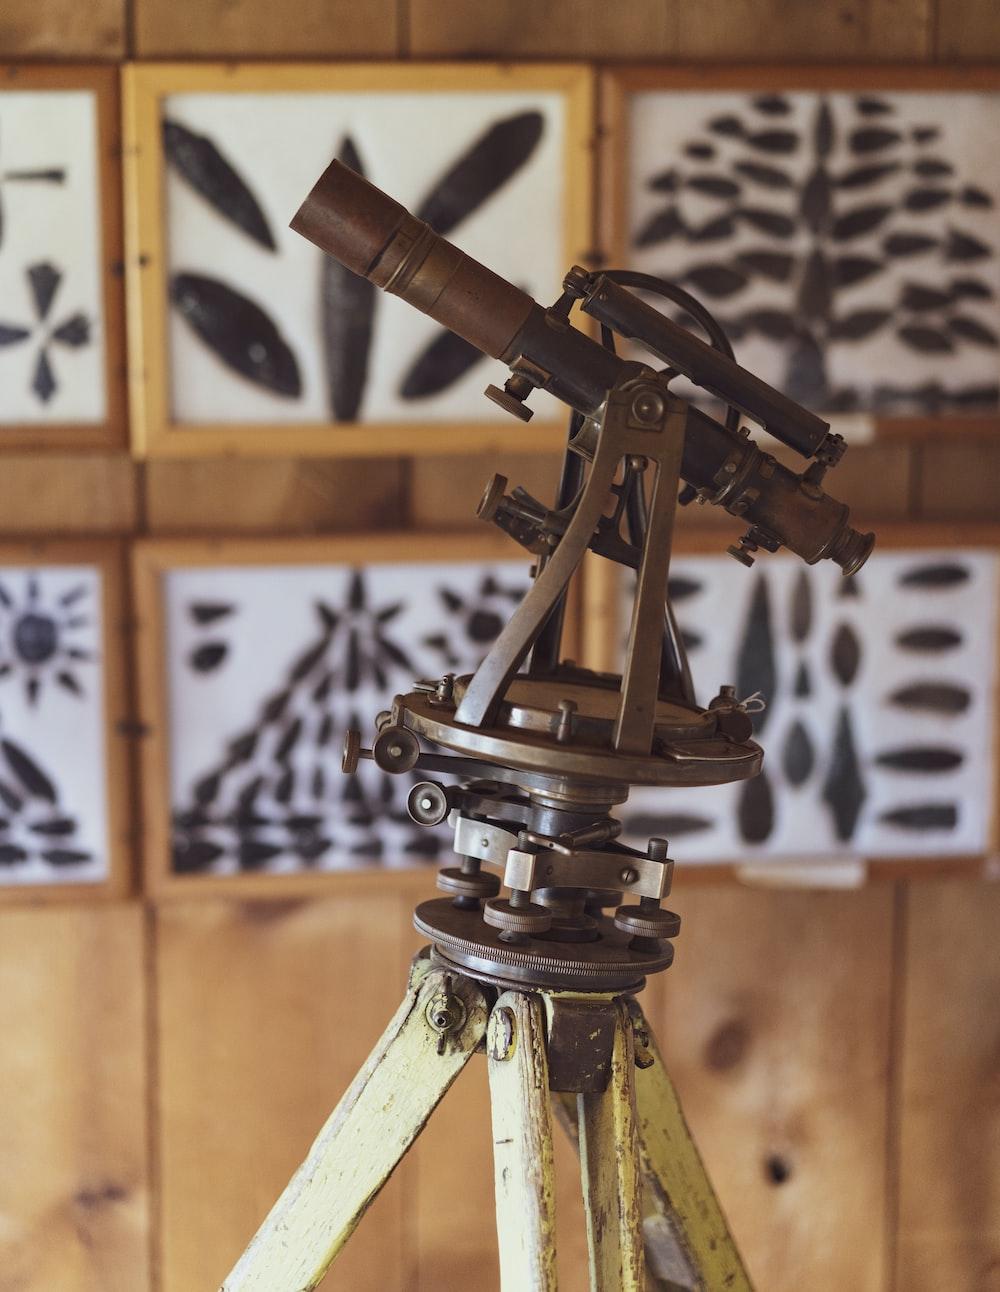 brown metal sextant